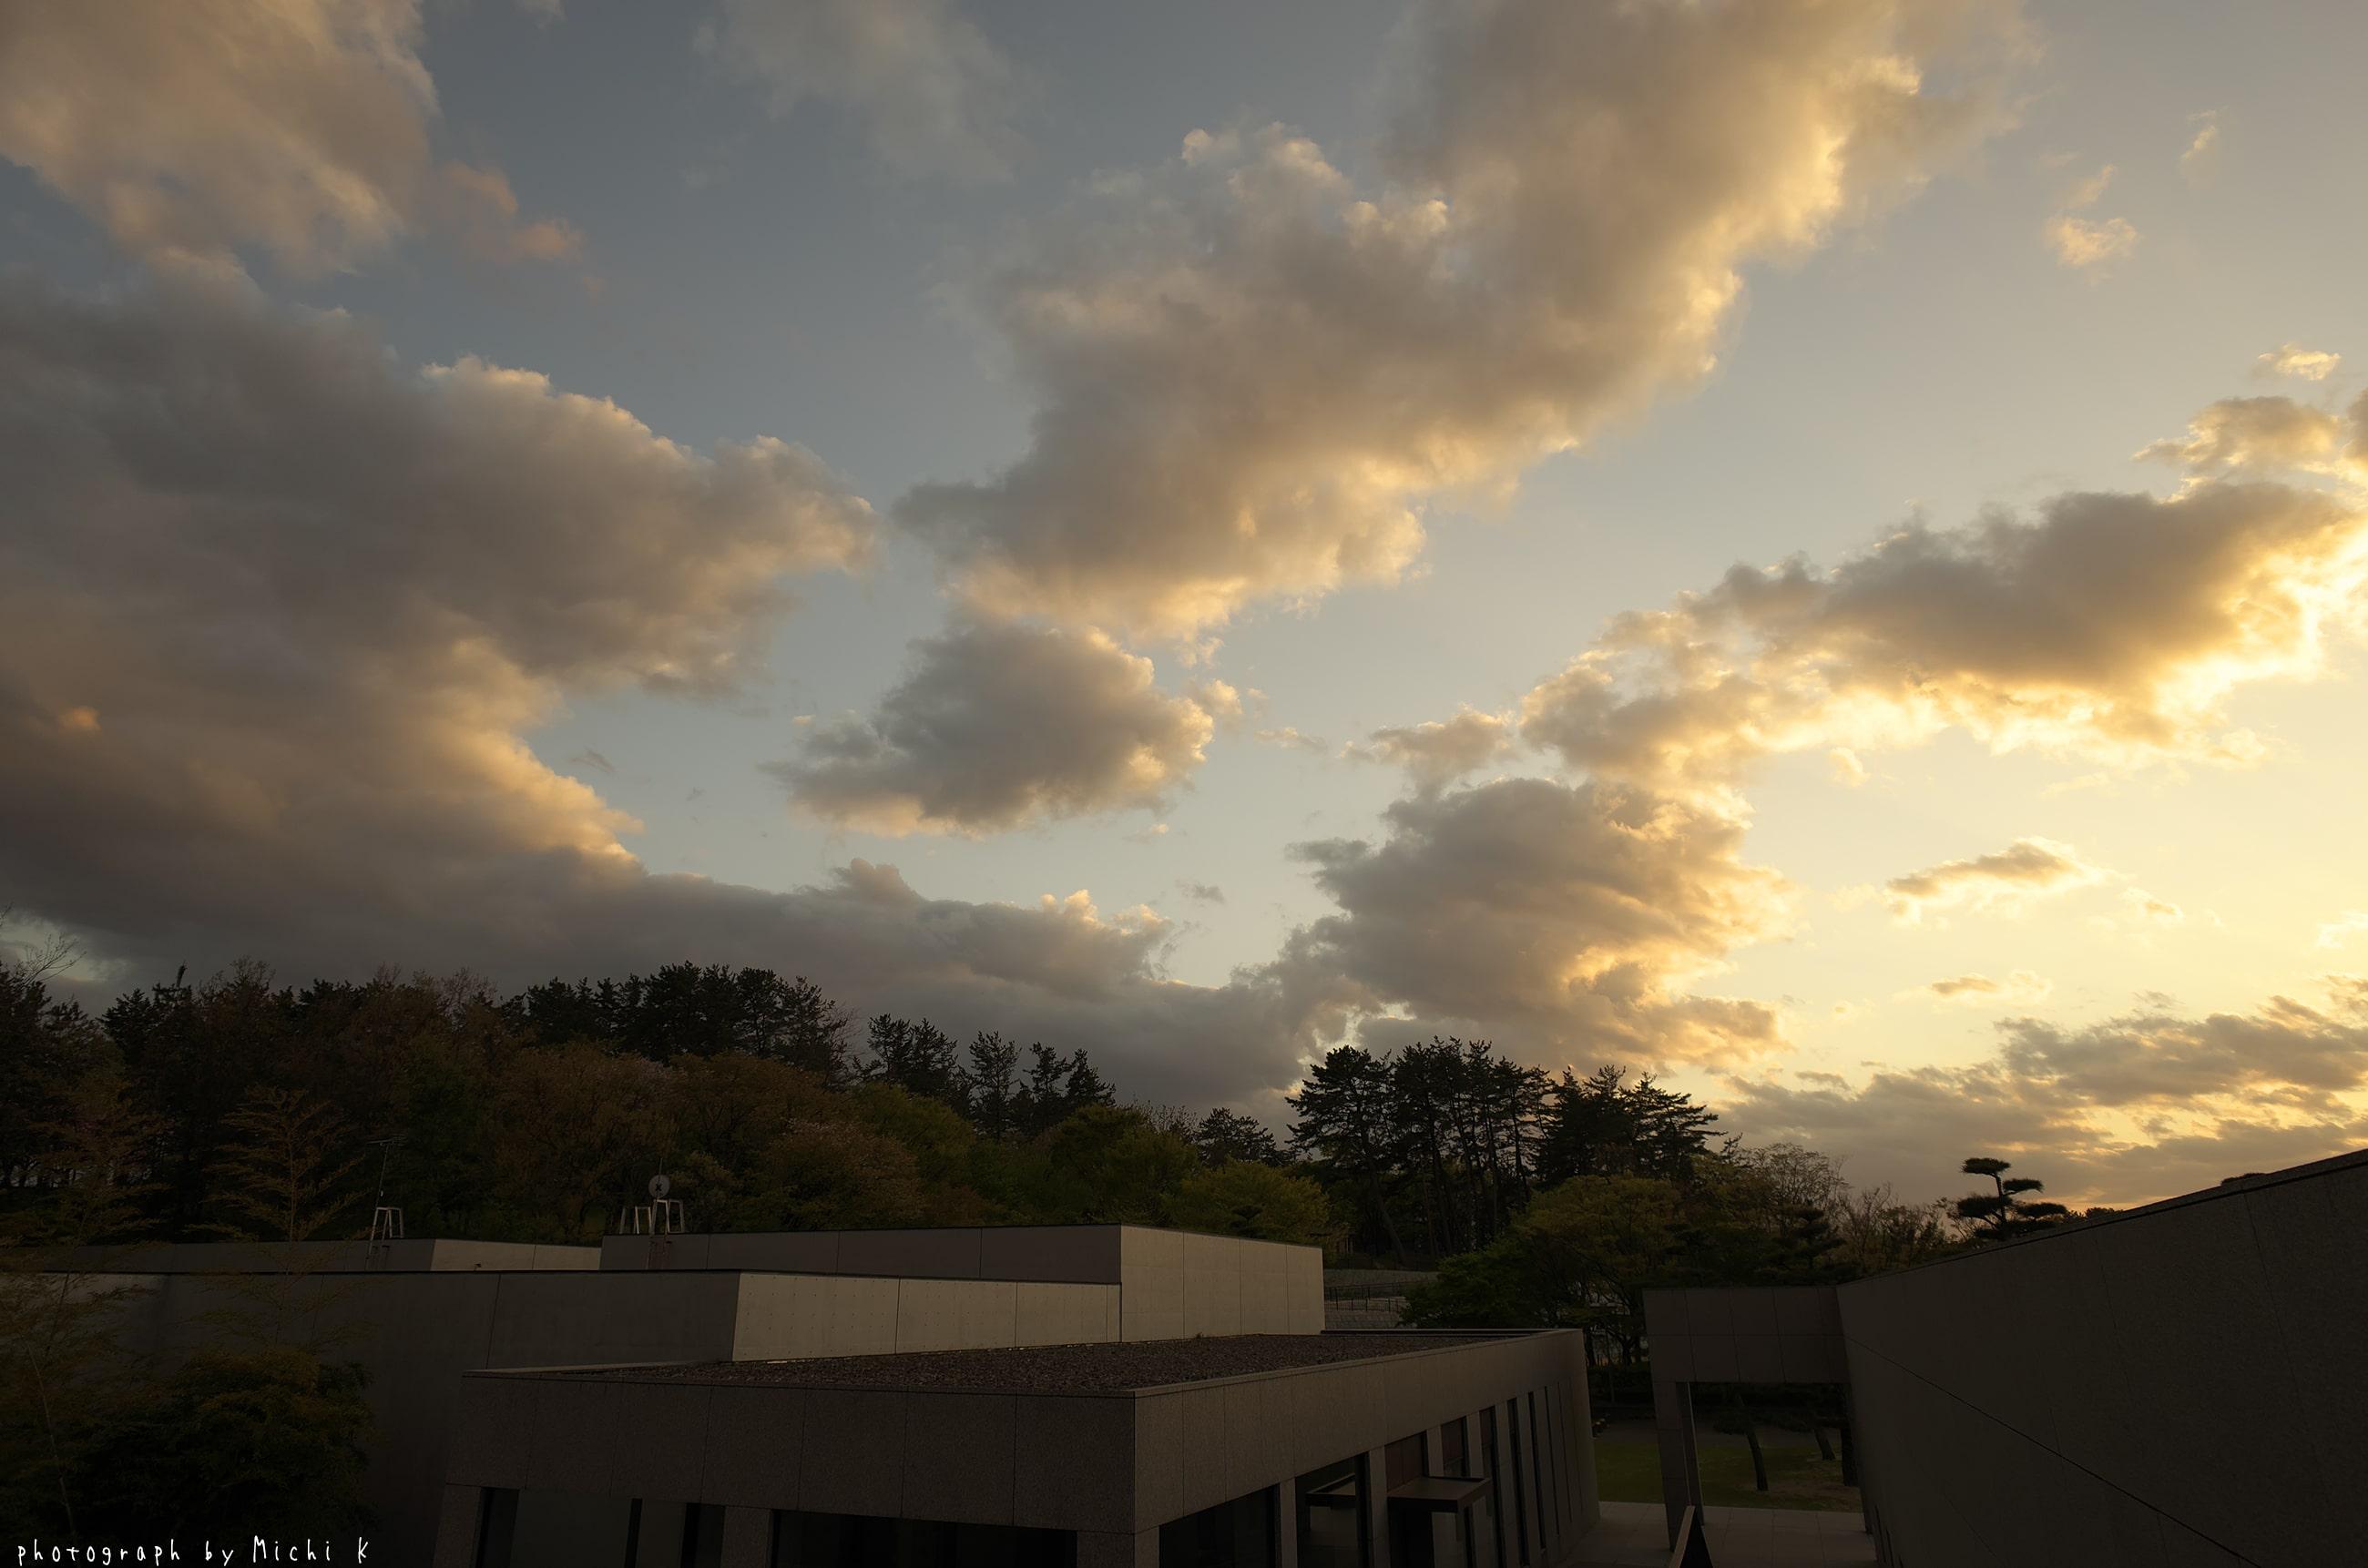 土門拳記念館2019-5-2 夕方(写真その1)